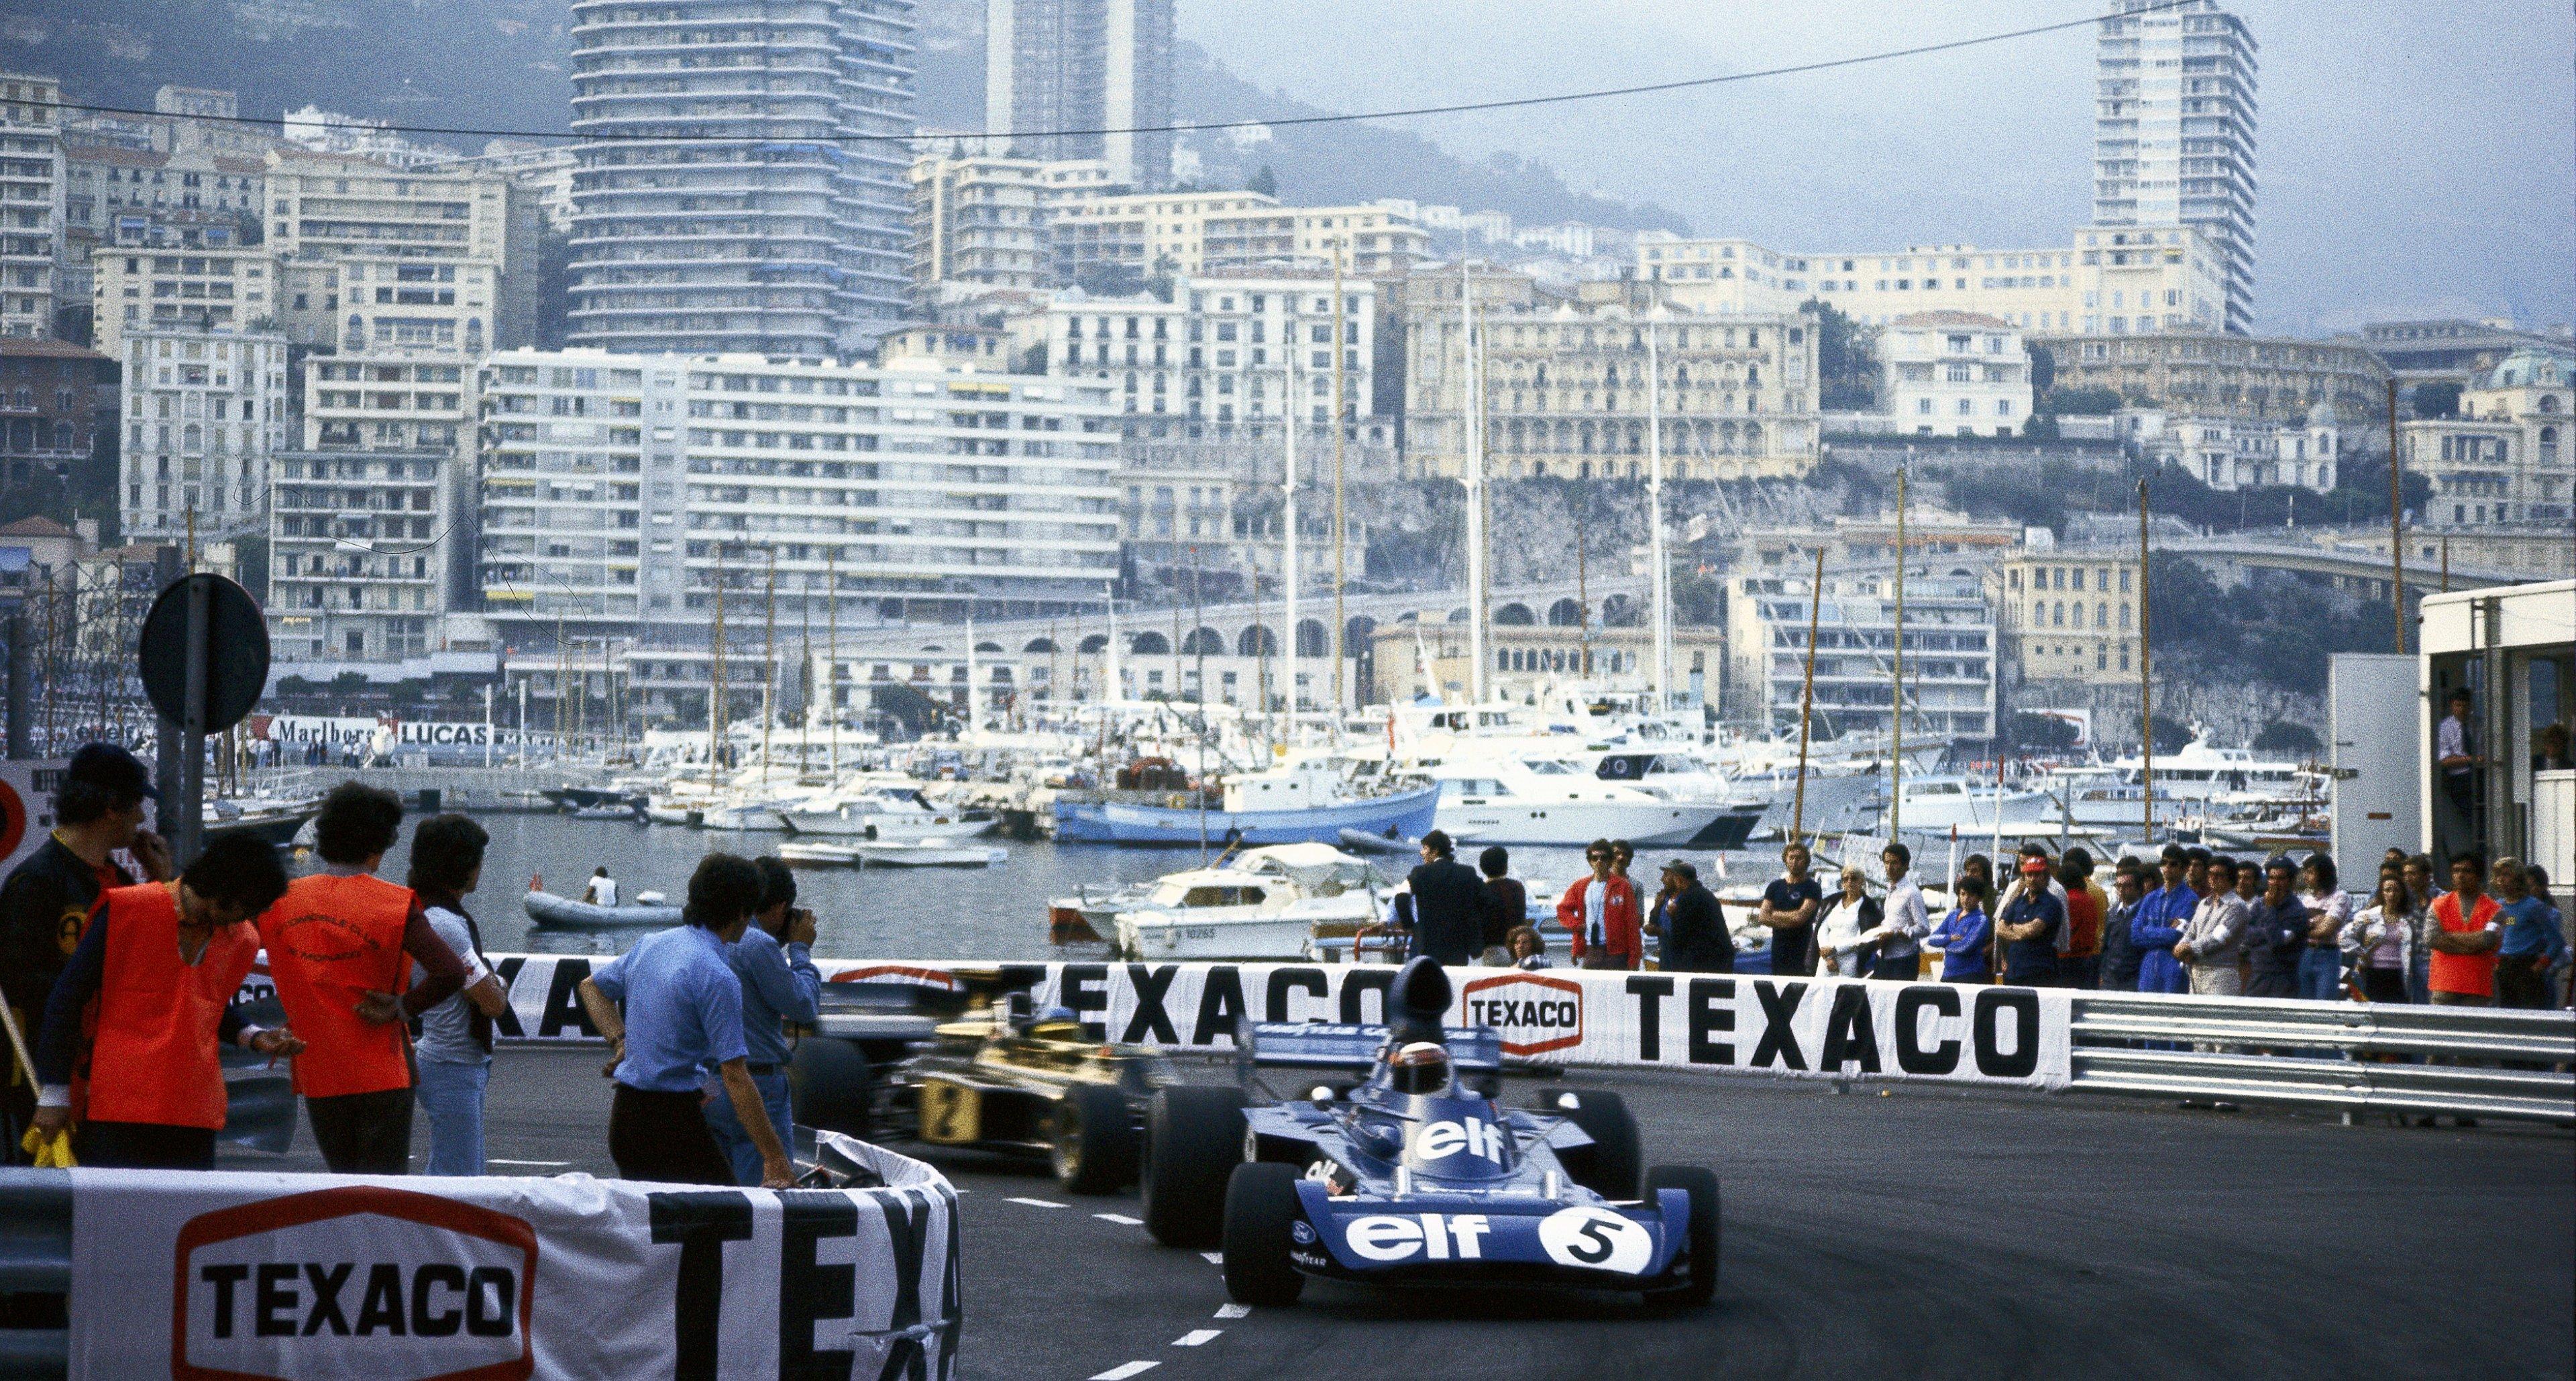 Jackie Stewart leads Peterson's Lotus at Monaco Grand Prix 1973